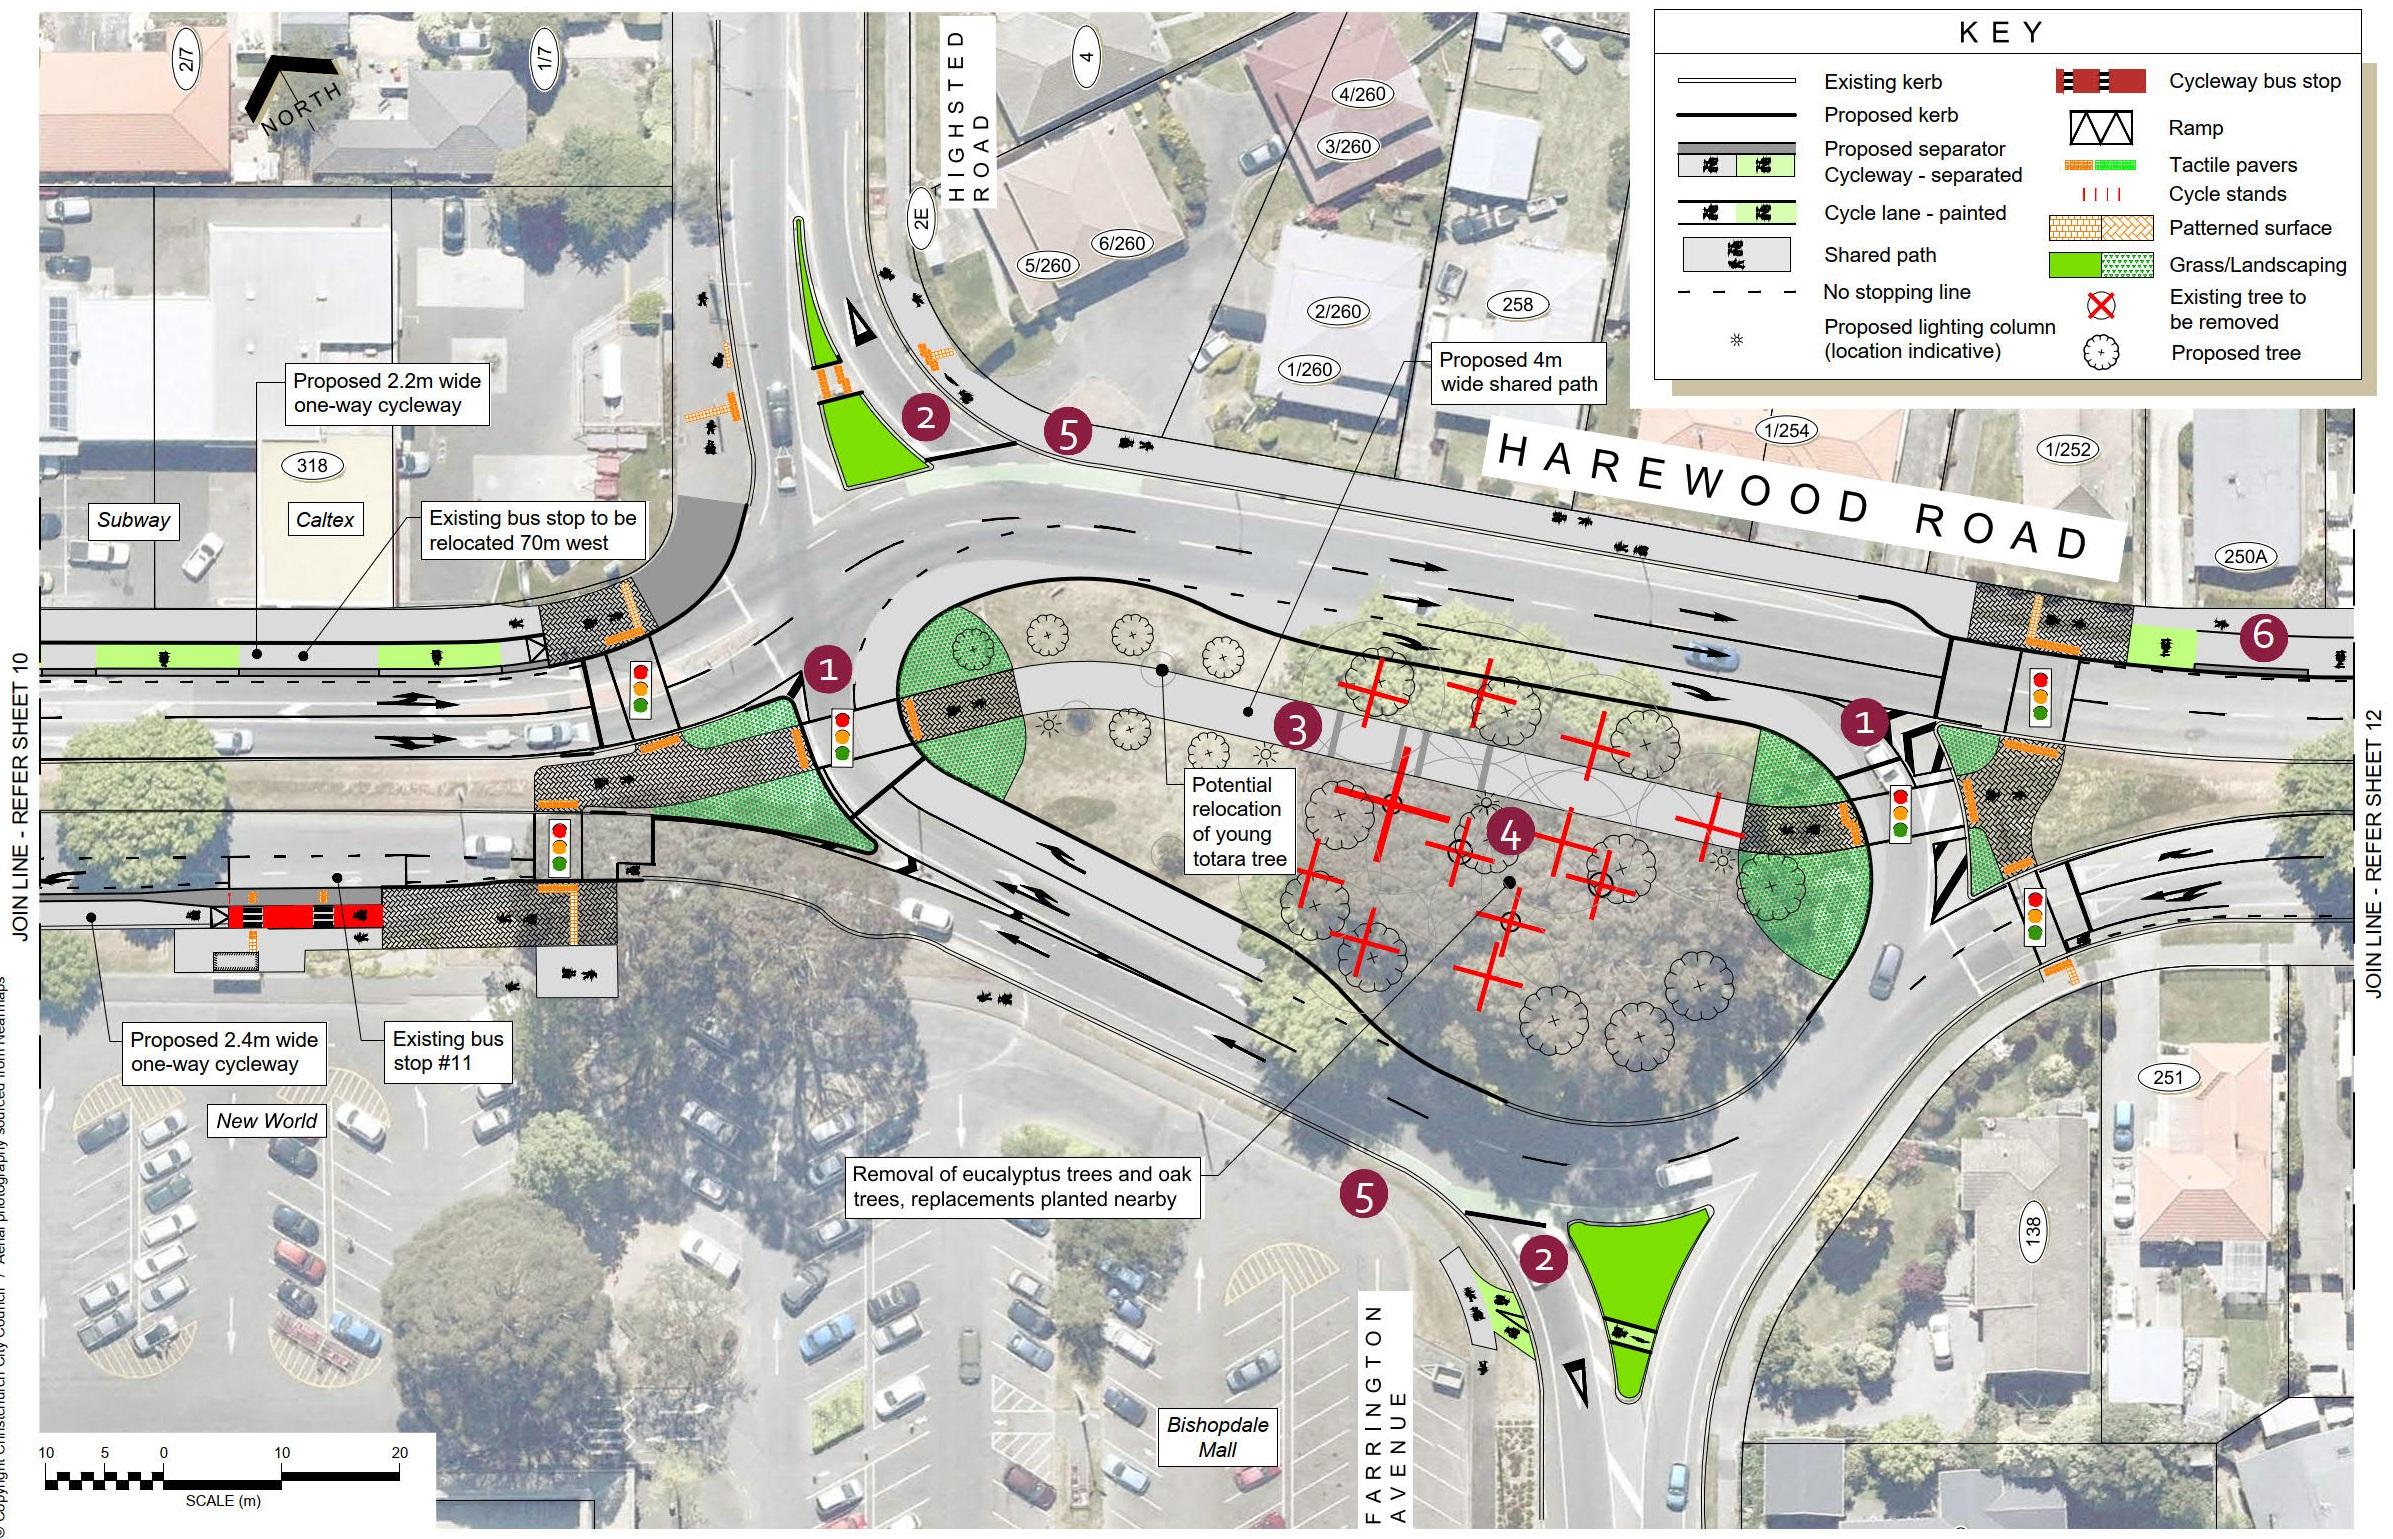 Plan 11 - Bishopdale Roundabout